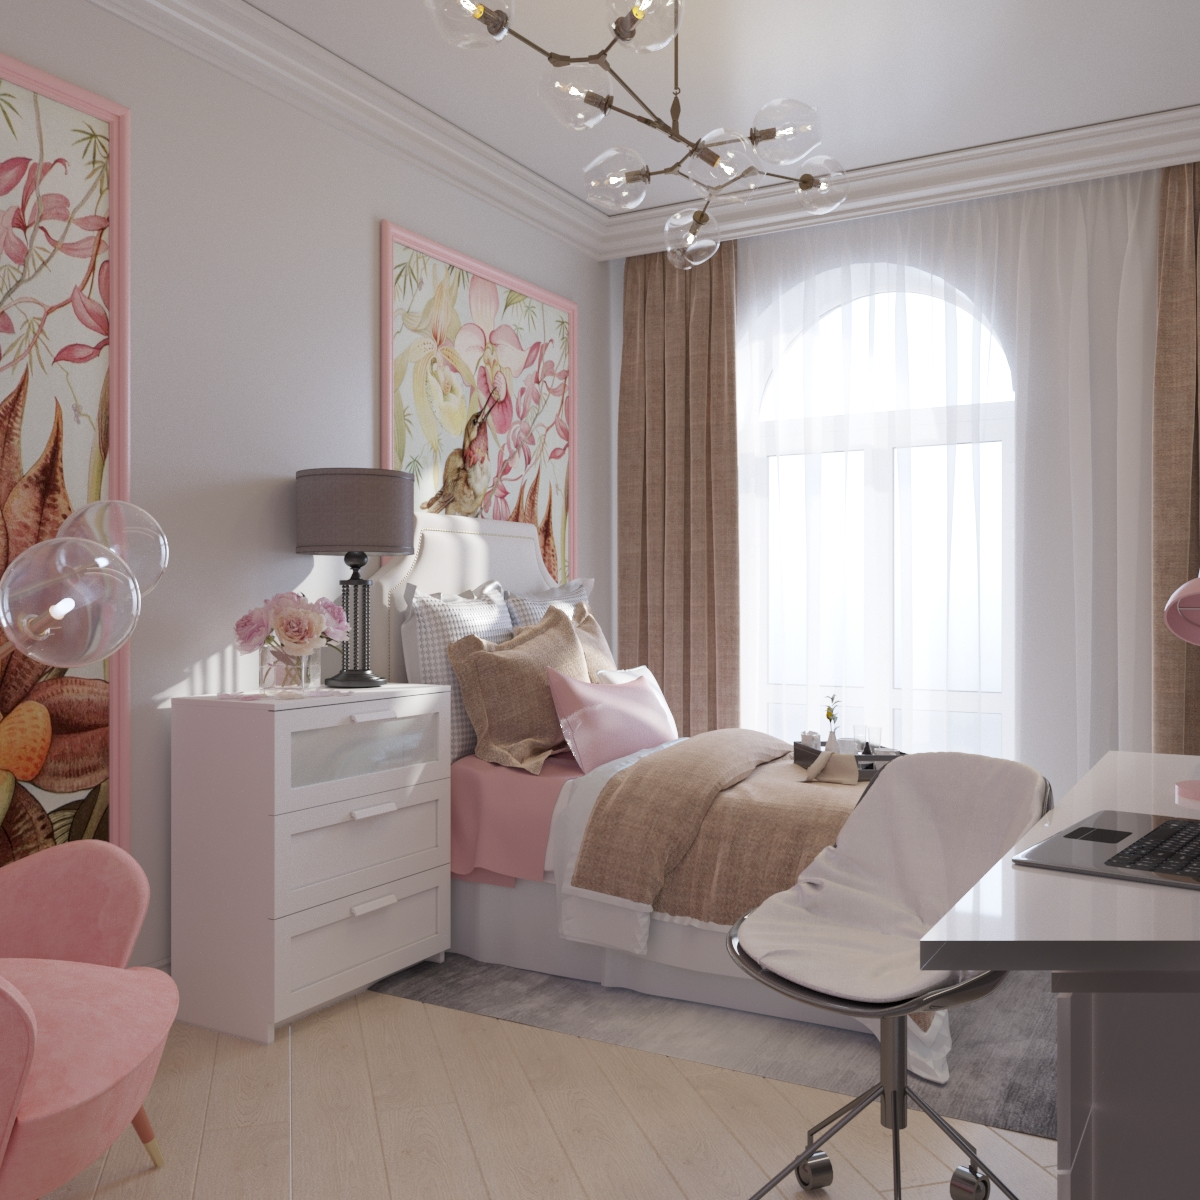 3х комнатная квартира (Современная классика)